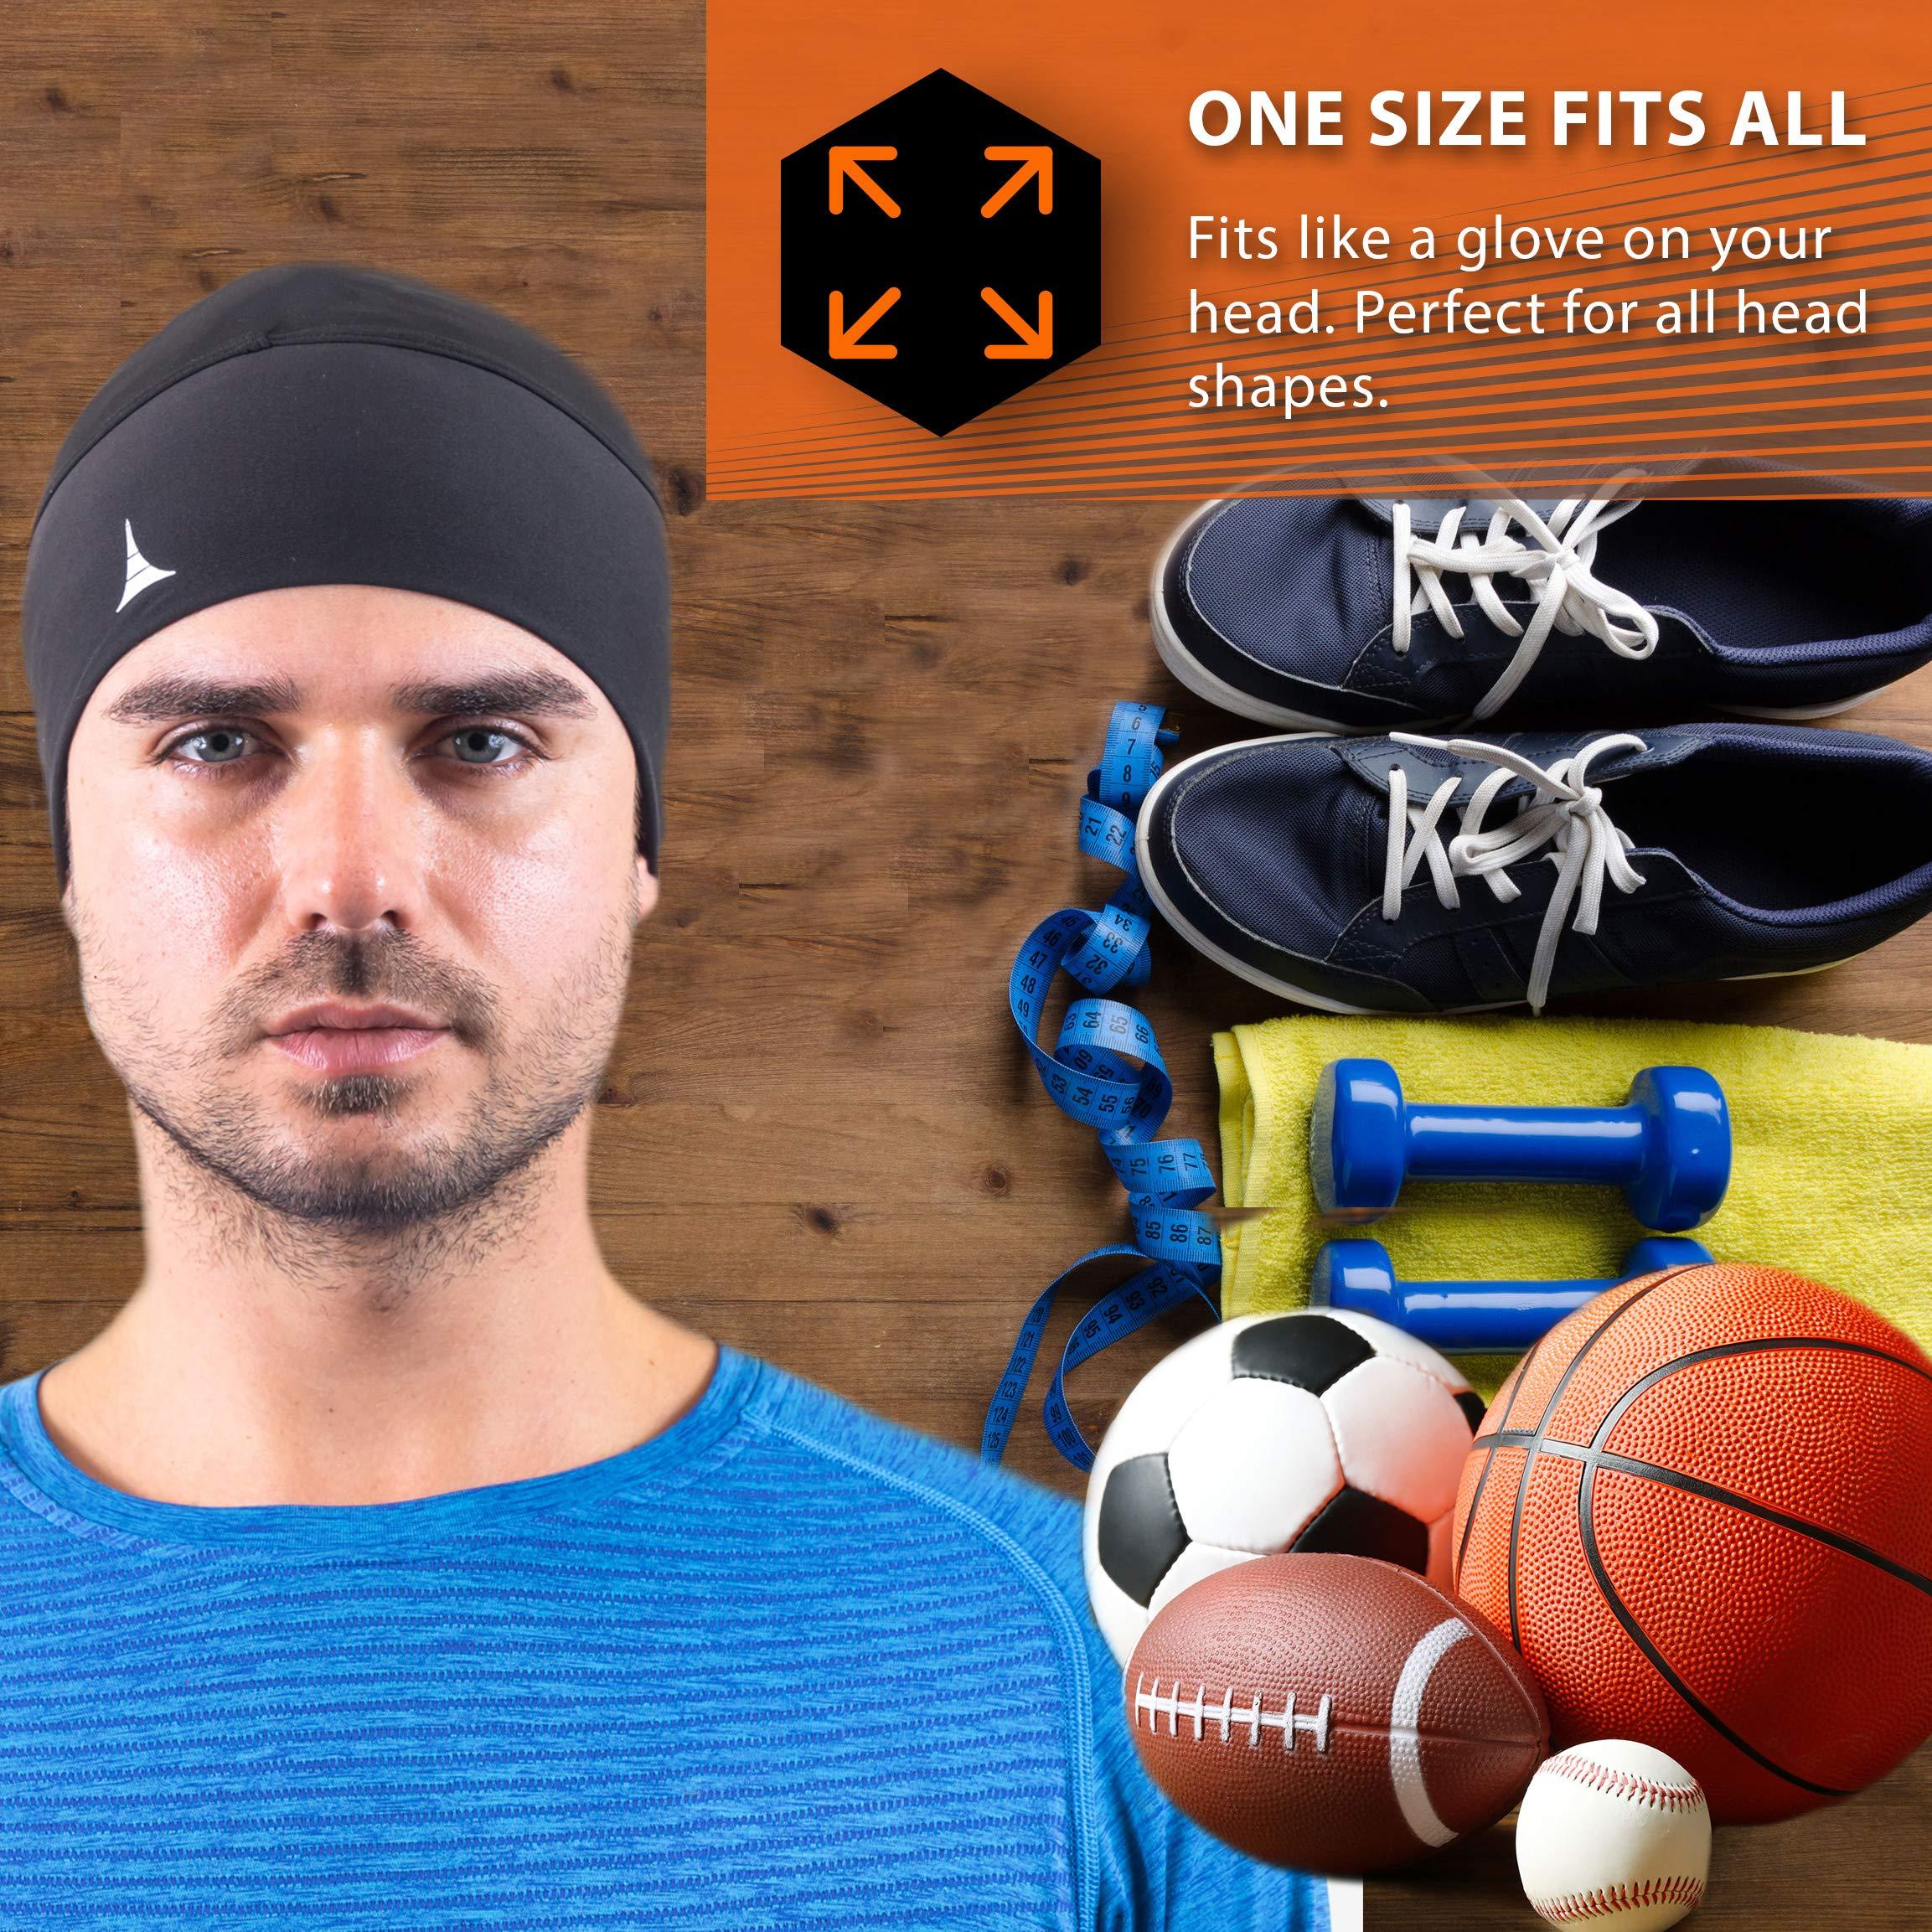 e26188bf4cc French Fitness Revolution Skull Cap Helmet Liner Running Beanie - Ultimate  Thermal Retention and Performance Moisture Wicking. Fits Under Helmets.  Store ...